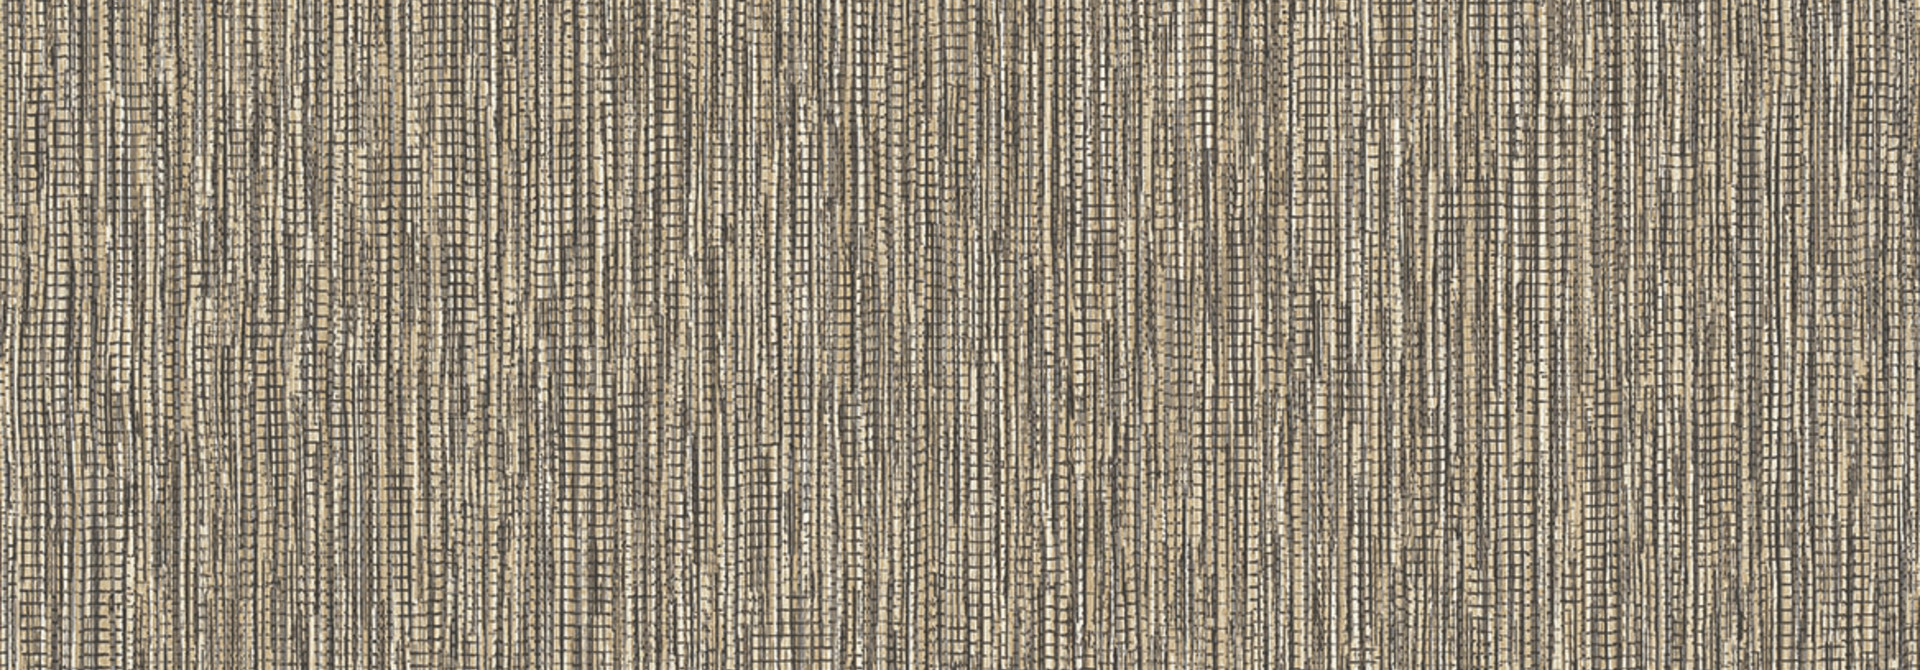 Behang  5026 Gember